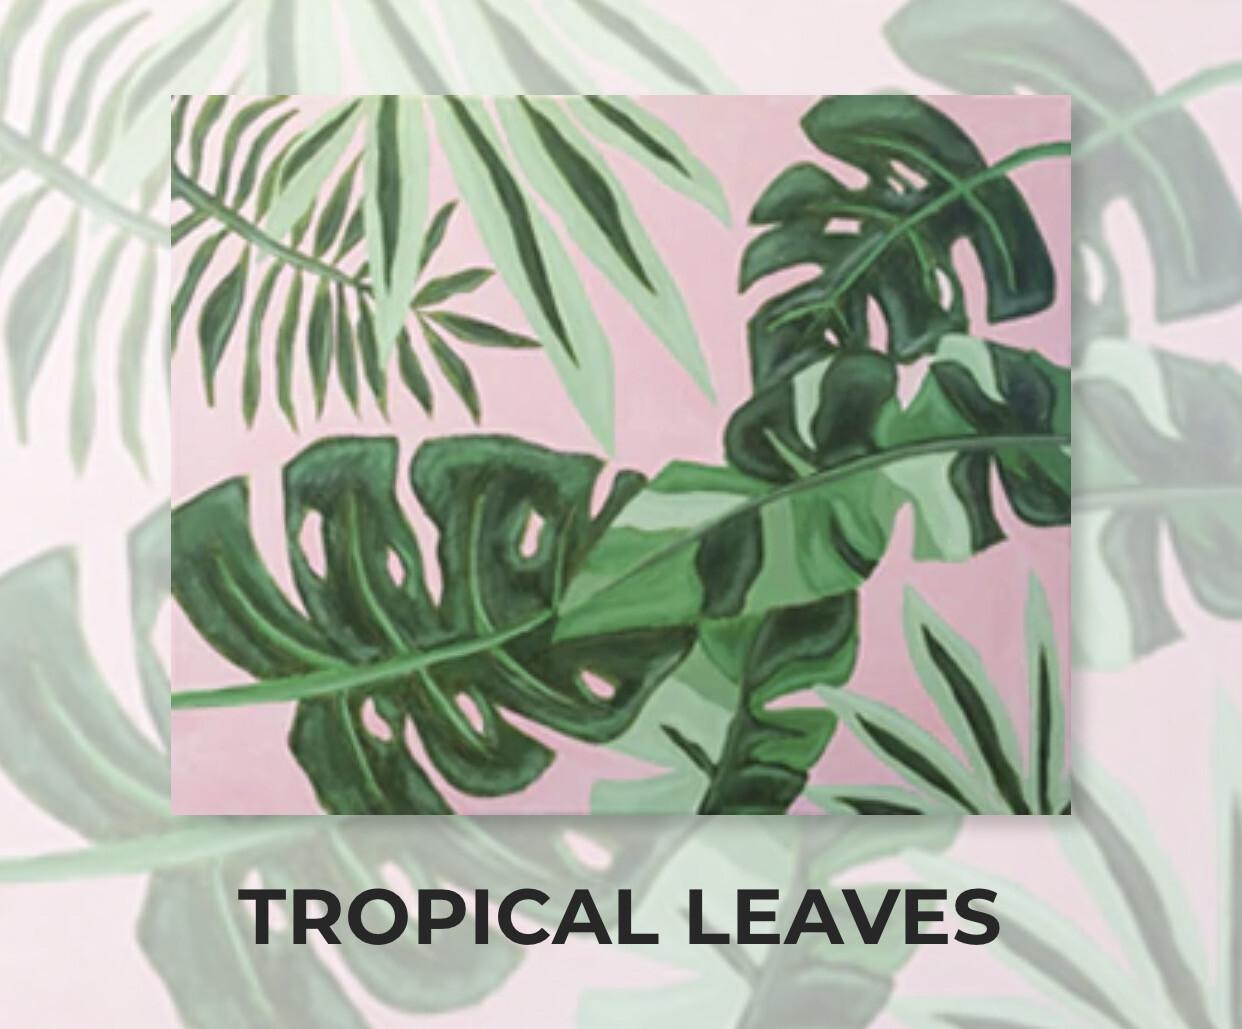 Tropical Leaves ADULT Acrylic Paint On Canvas DIY Art Kit